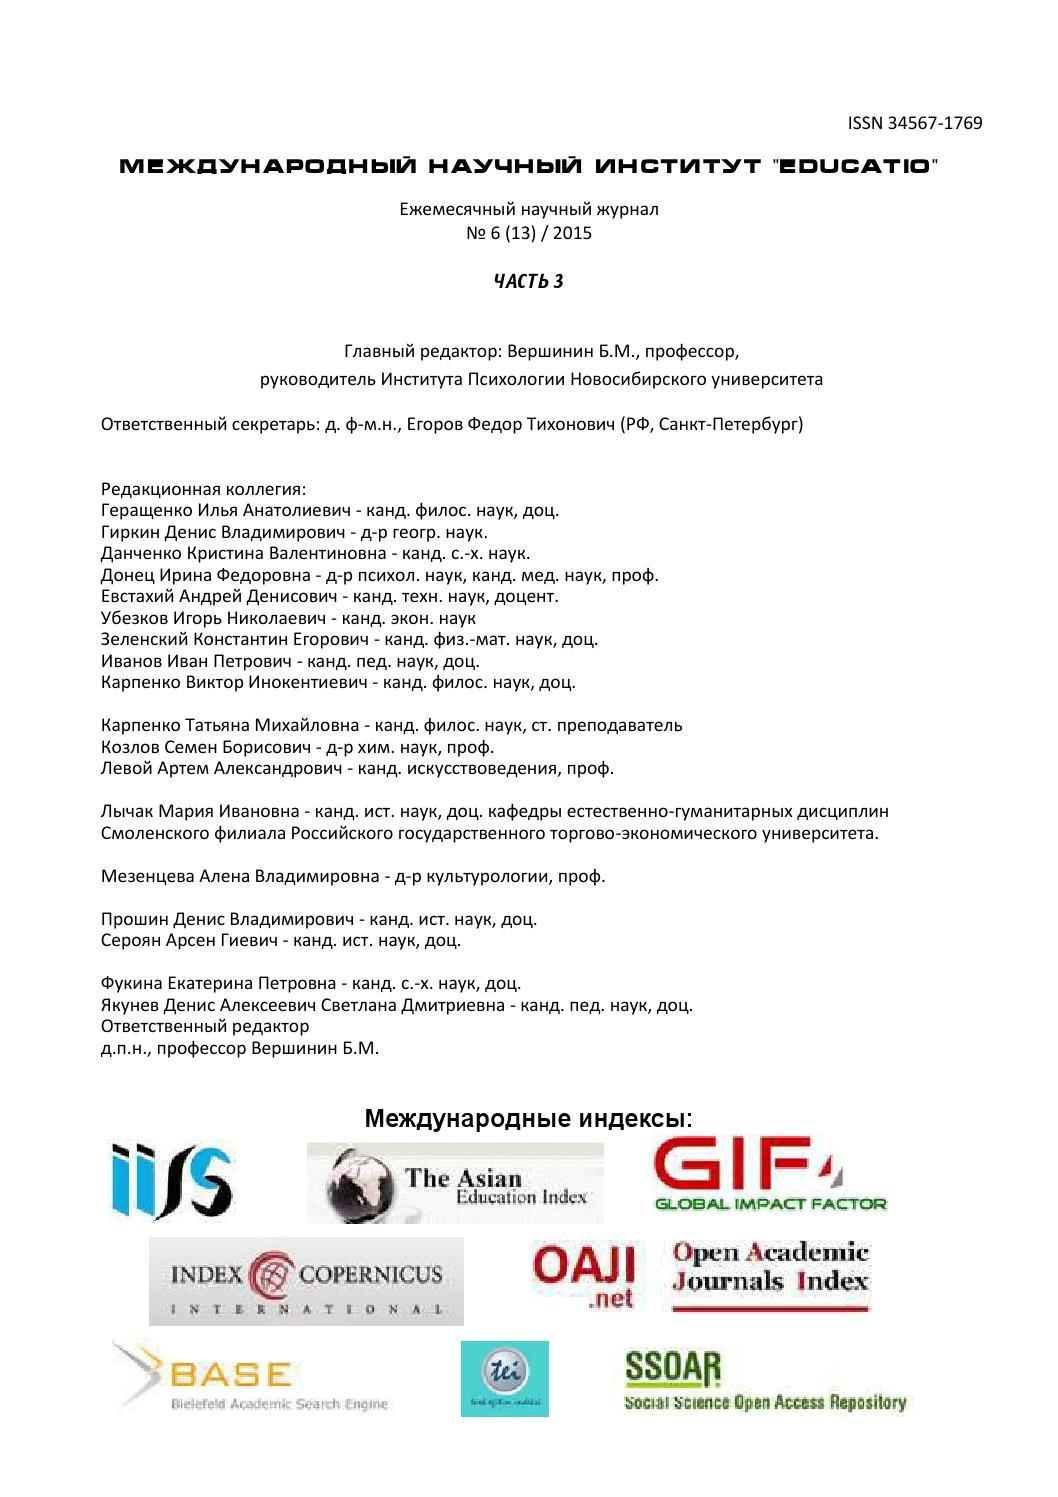 Edu 13 P3 By международный научный институт Educatio Issuu